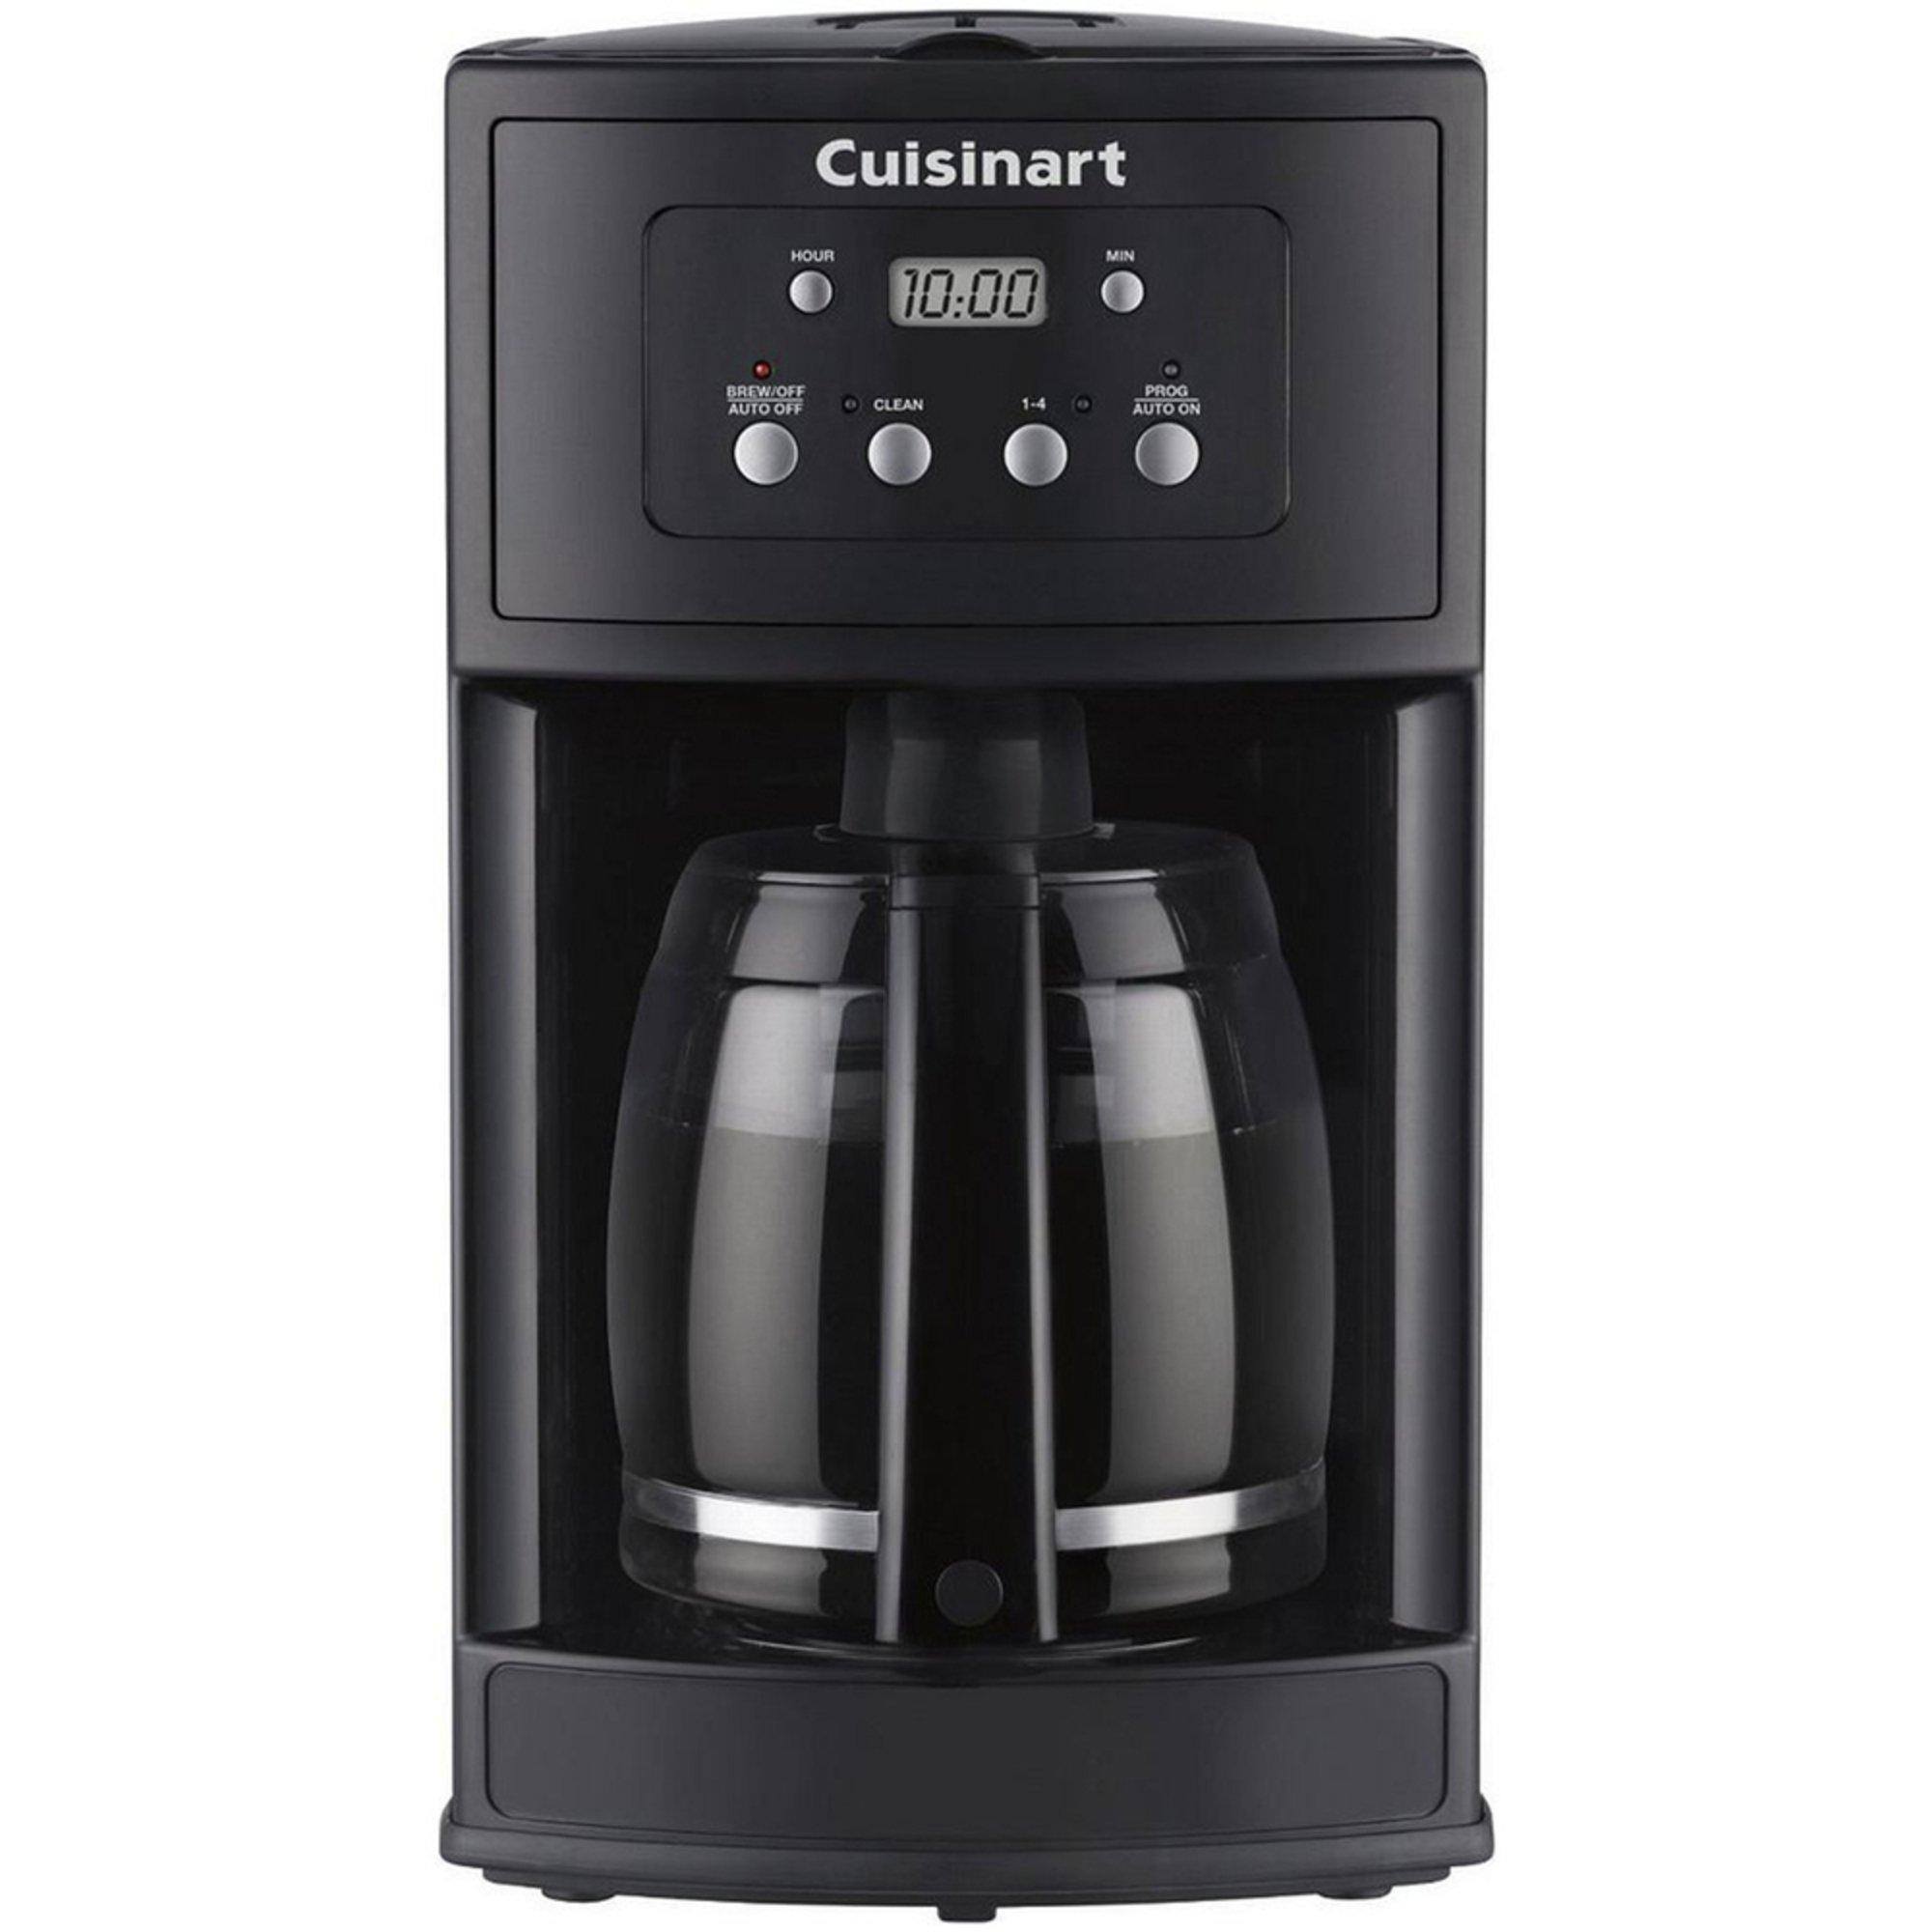 Cuisinart Coffee Maker Dcc 500 : Cuisinart Dcc-500 12-cup Programmable Coffee Maker Coffee Makers For The Home - Shop Your ...